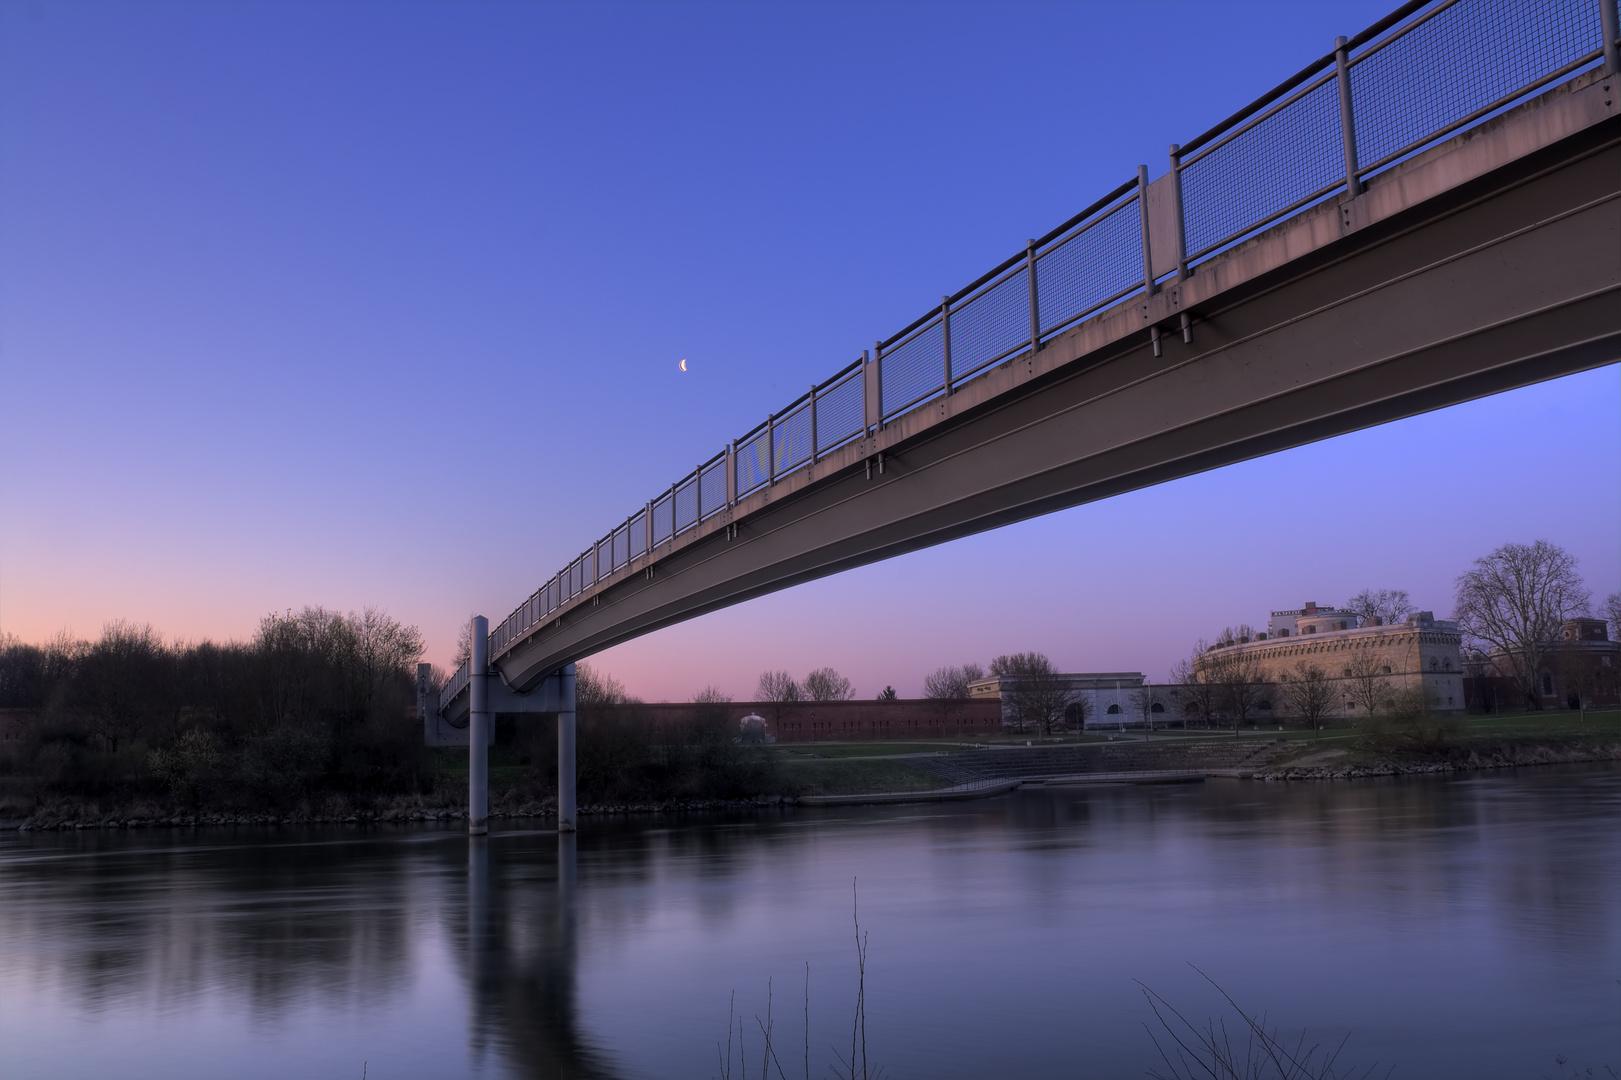 Ingolstadt Brücke